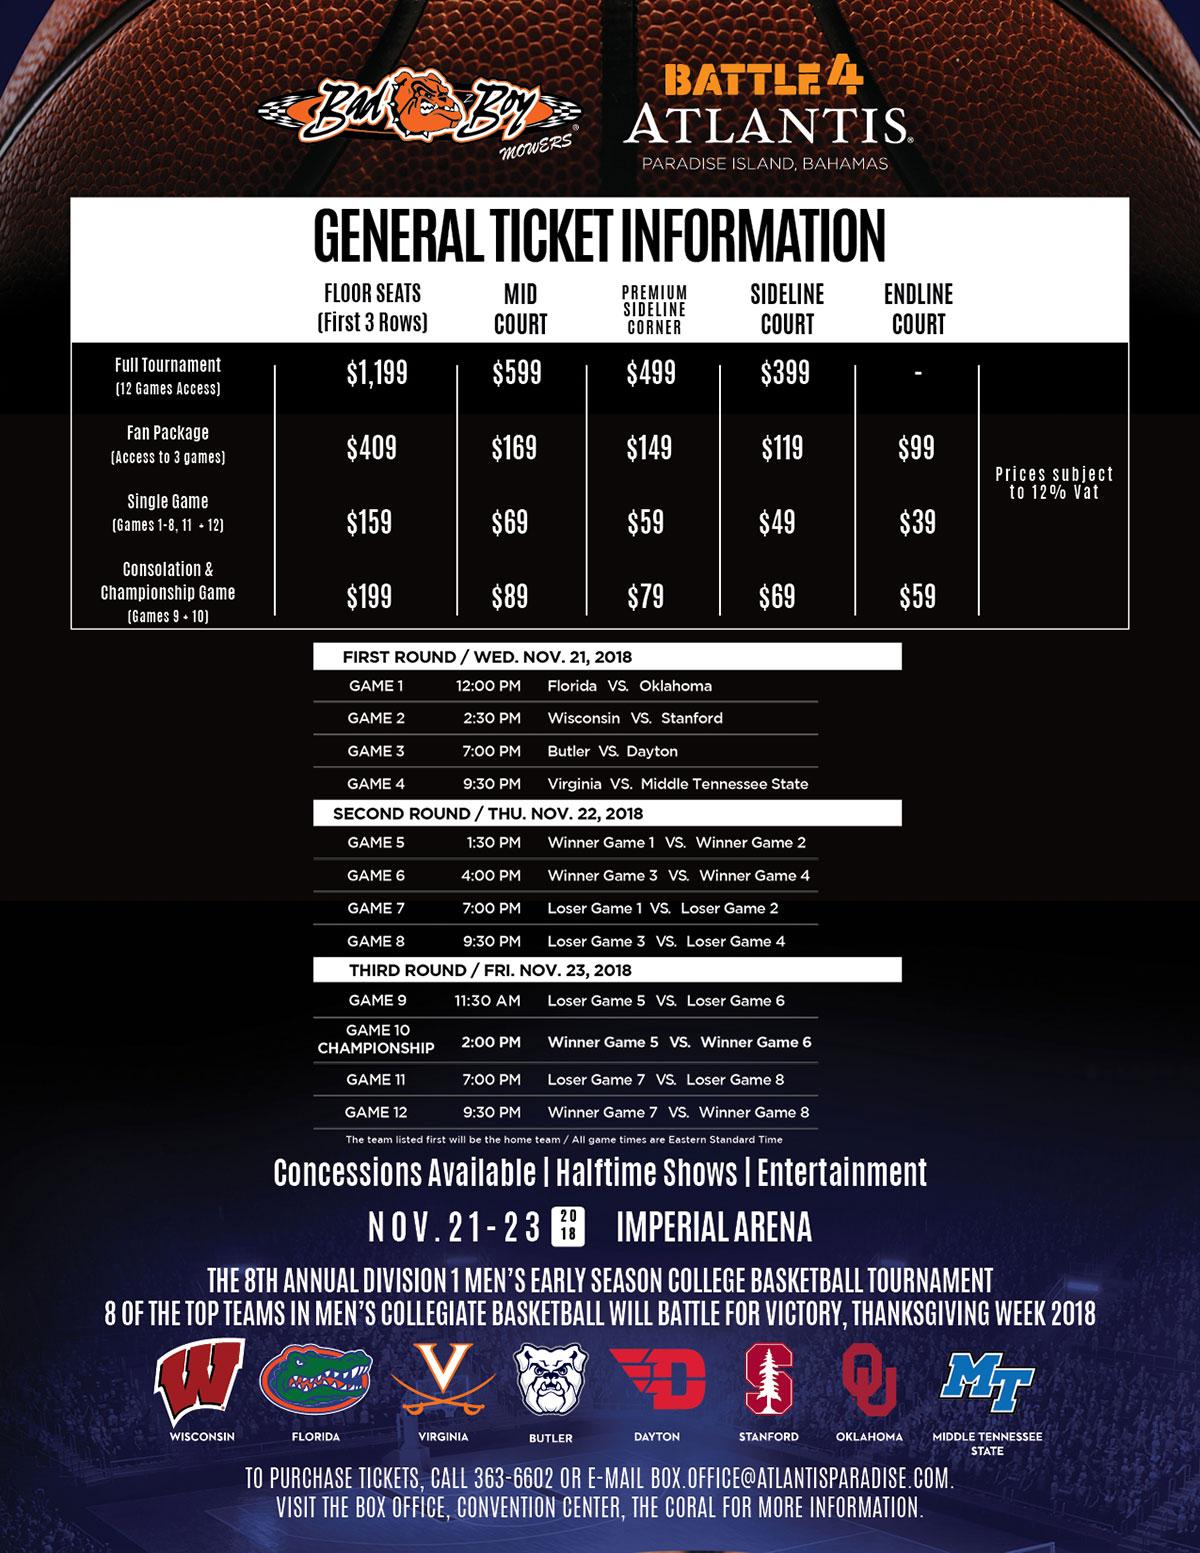 Battle 4 Atlantis General Ticket Information